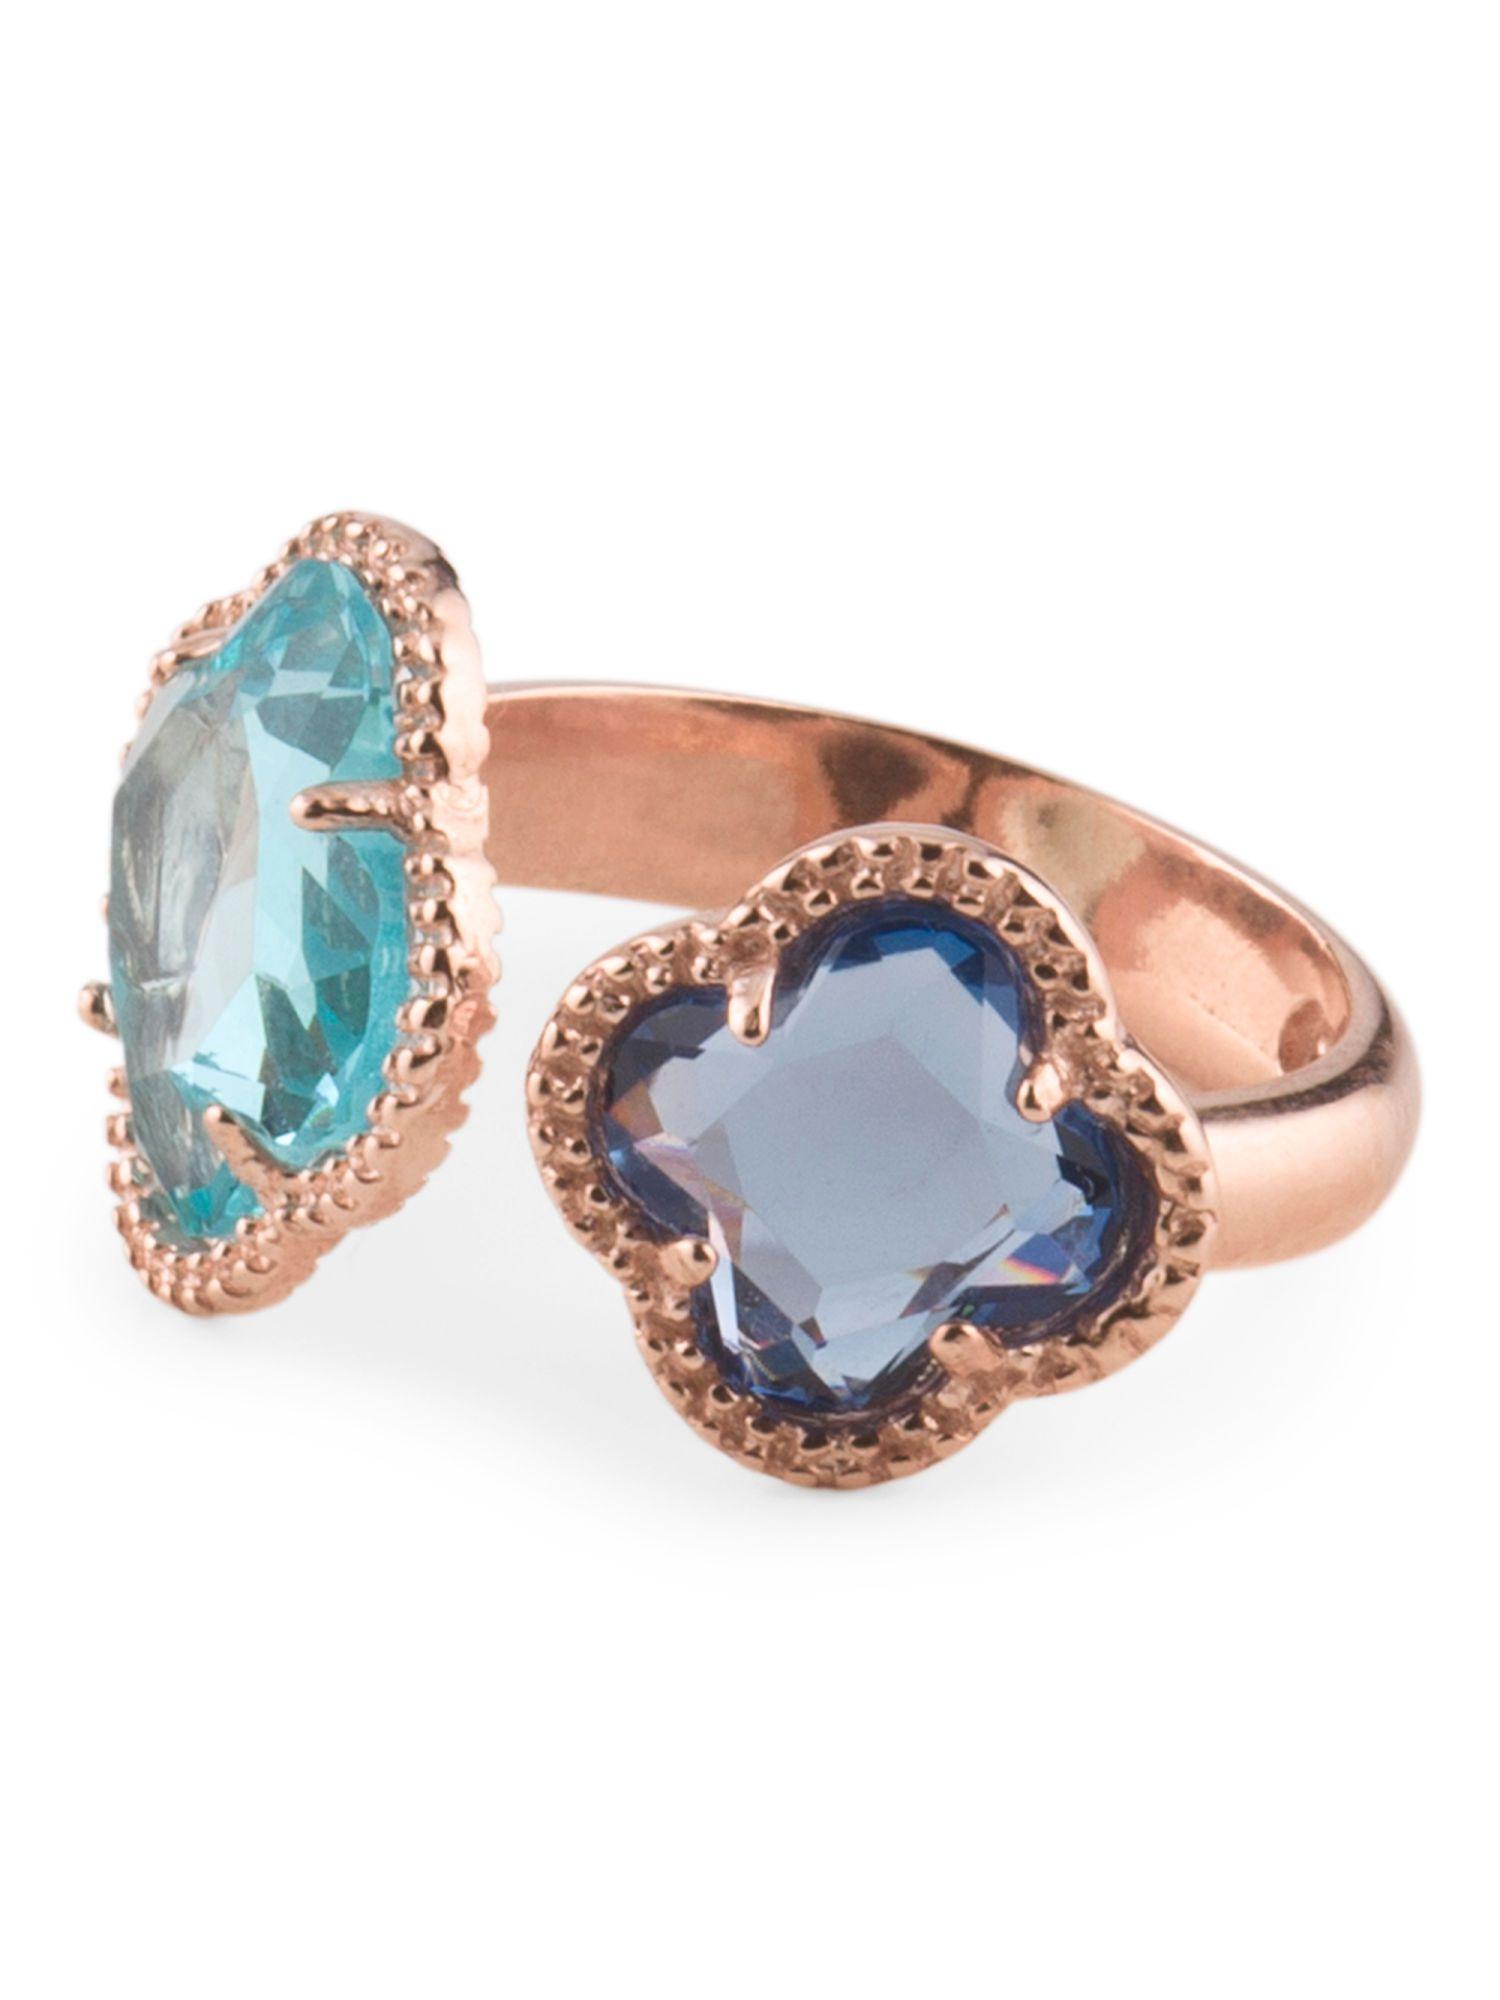 LOVE Mia Fiore and Bella Jack jewelry at TJ Maxx Christmas List